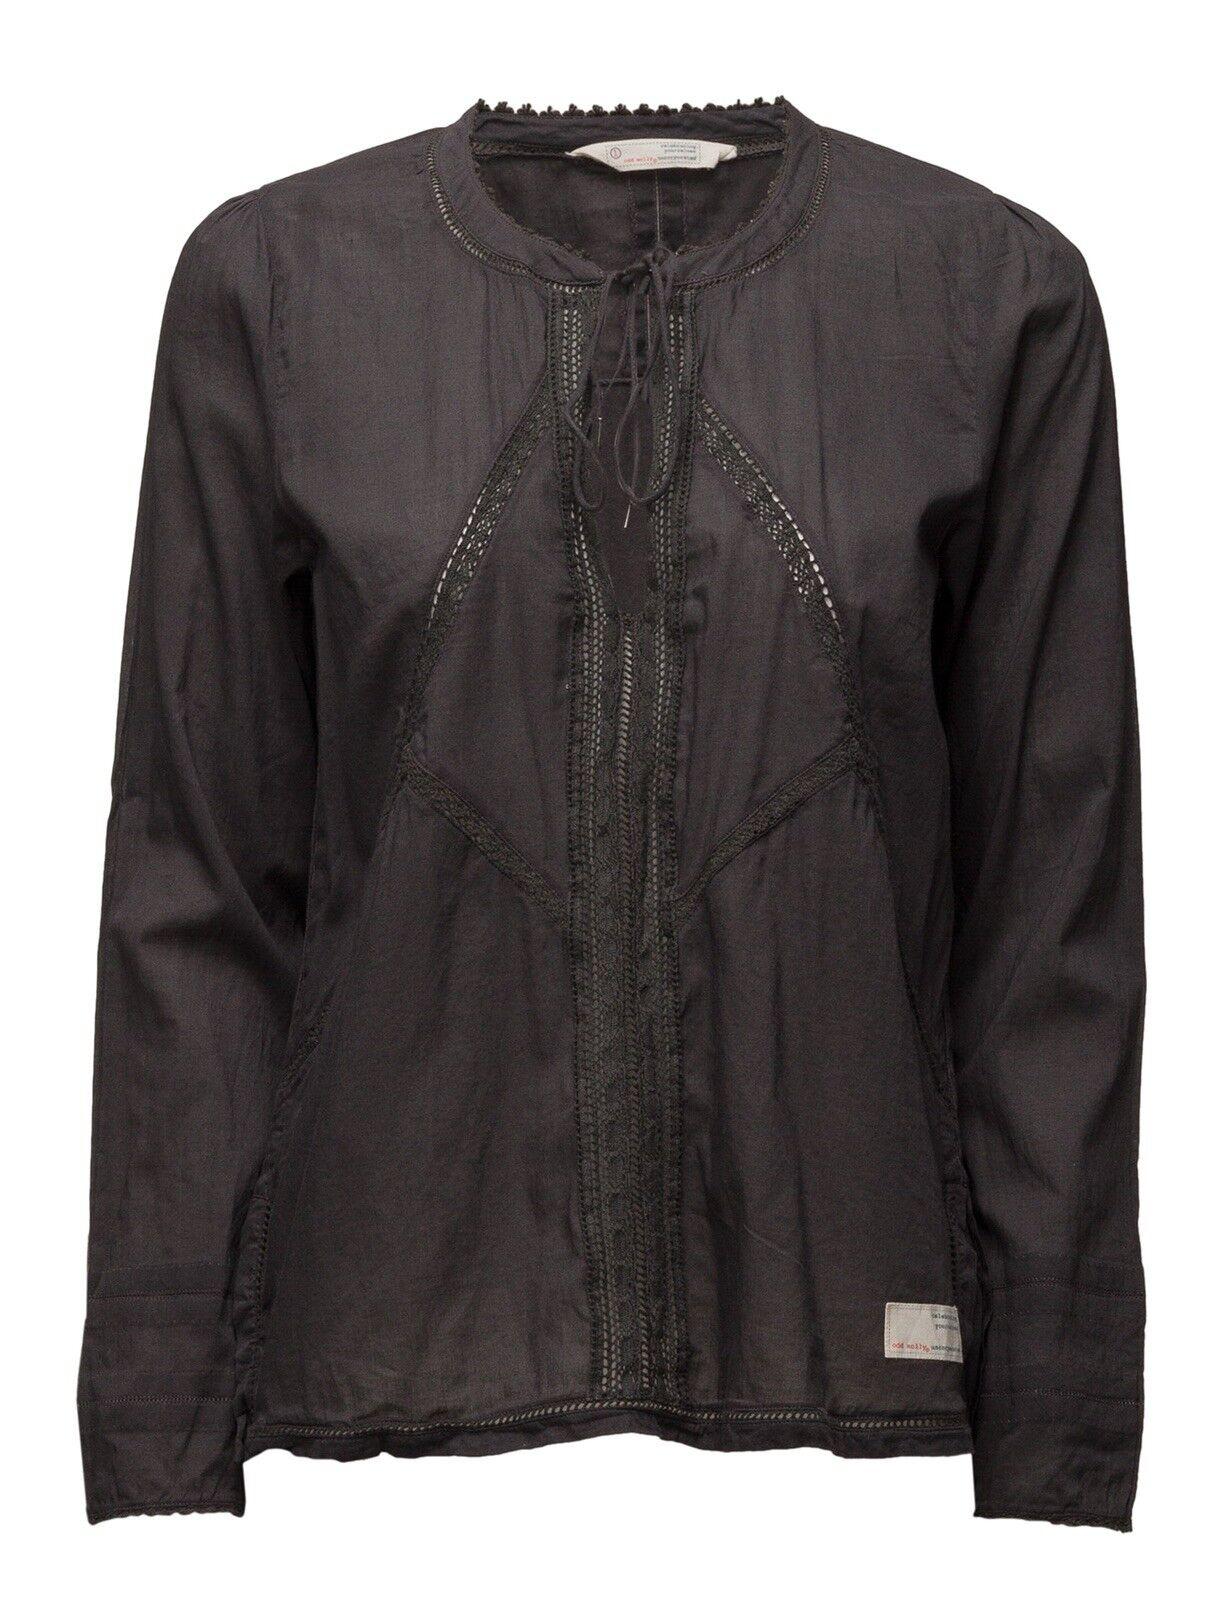 ODD MOLLY  Blause Tunika Boho  daylight blouse Asphalt Grau 117M-151  Gr. 2 38